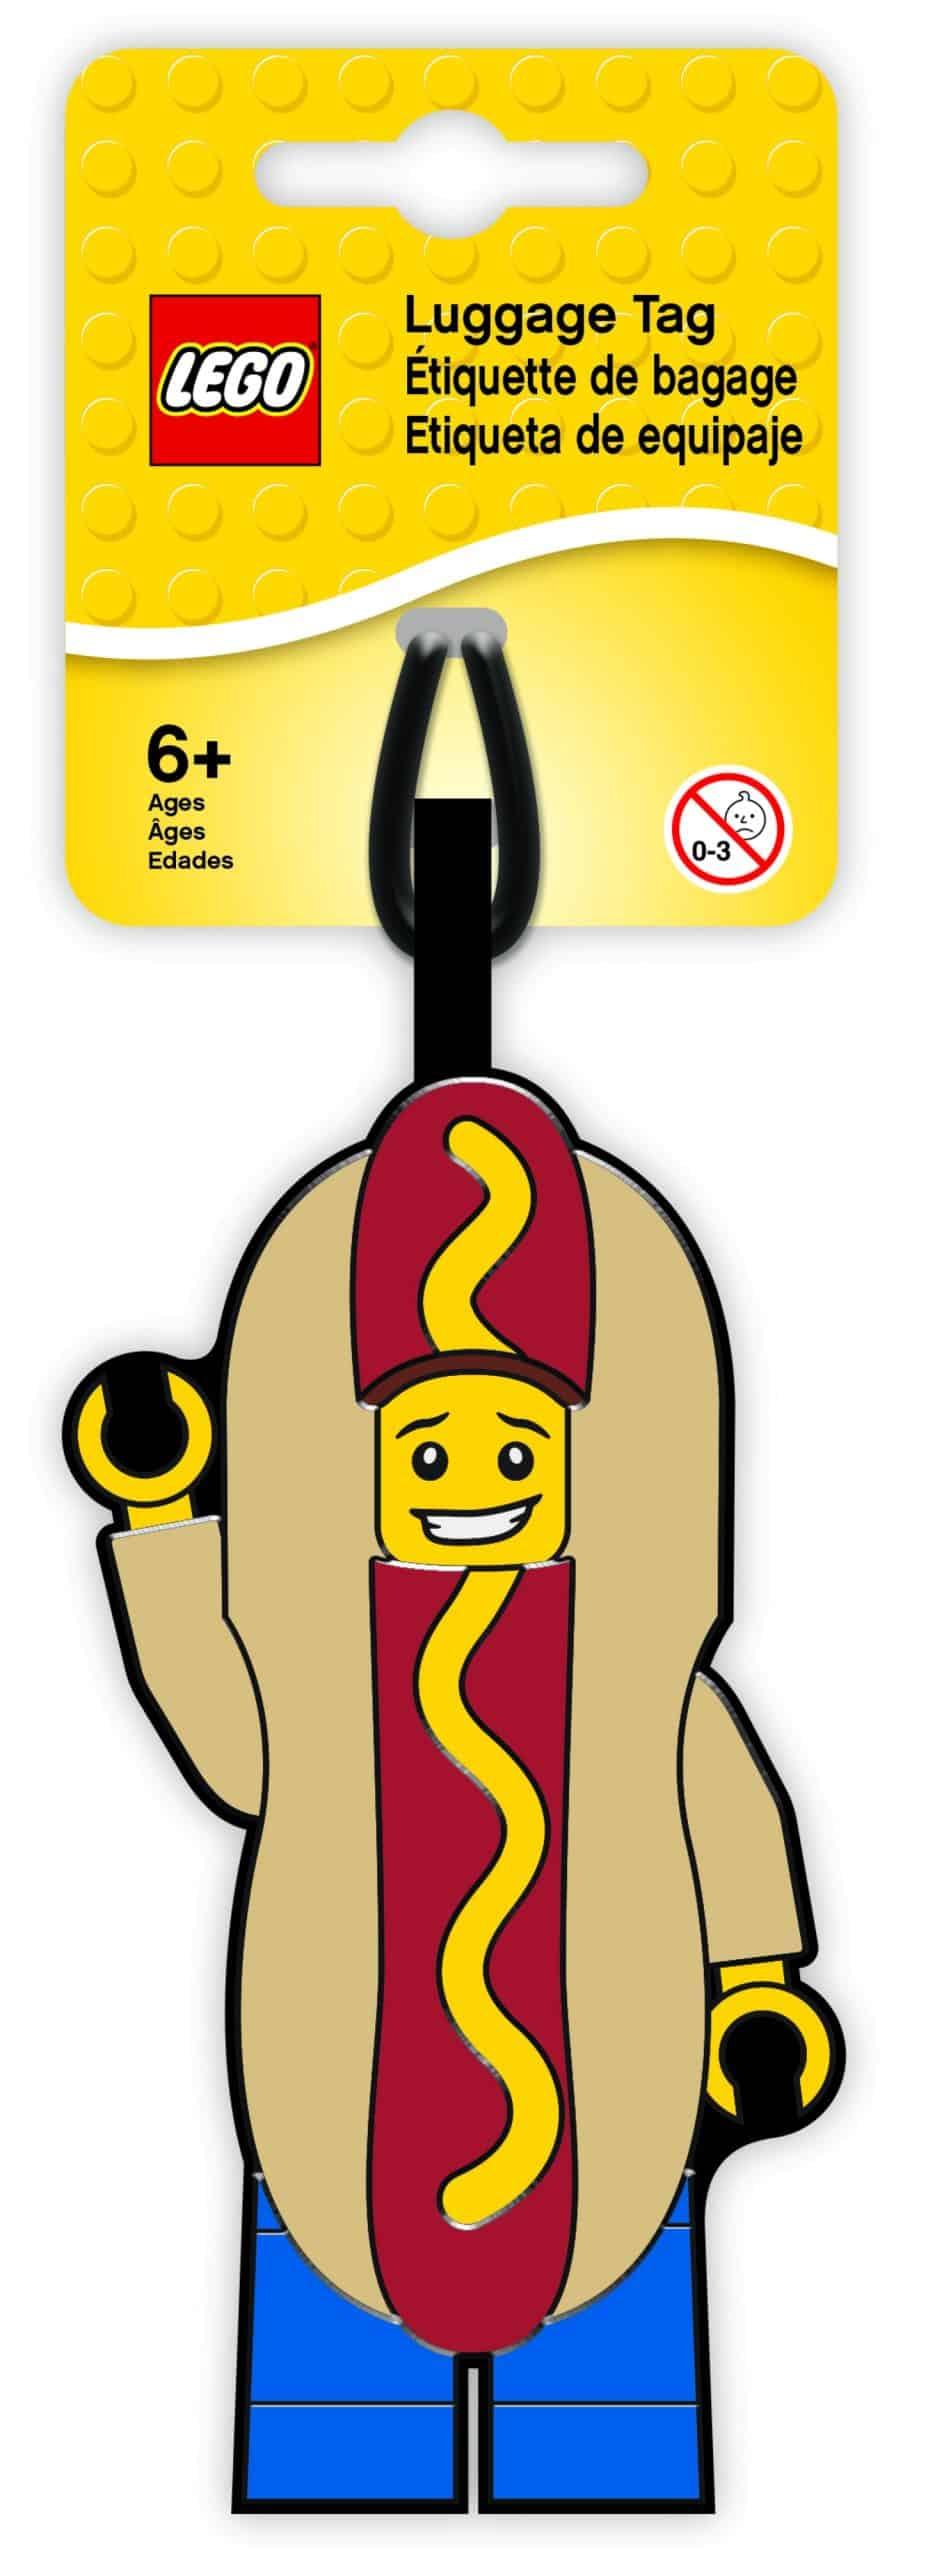 lego 5005582 bagagemaerke med hotdogmanden scaled